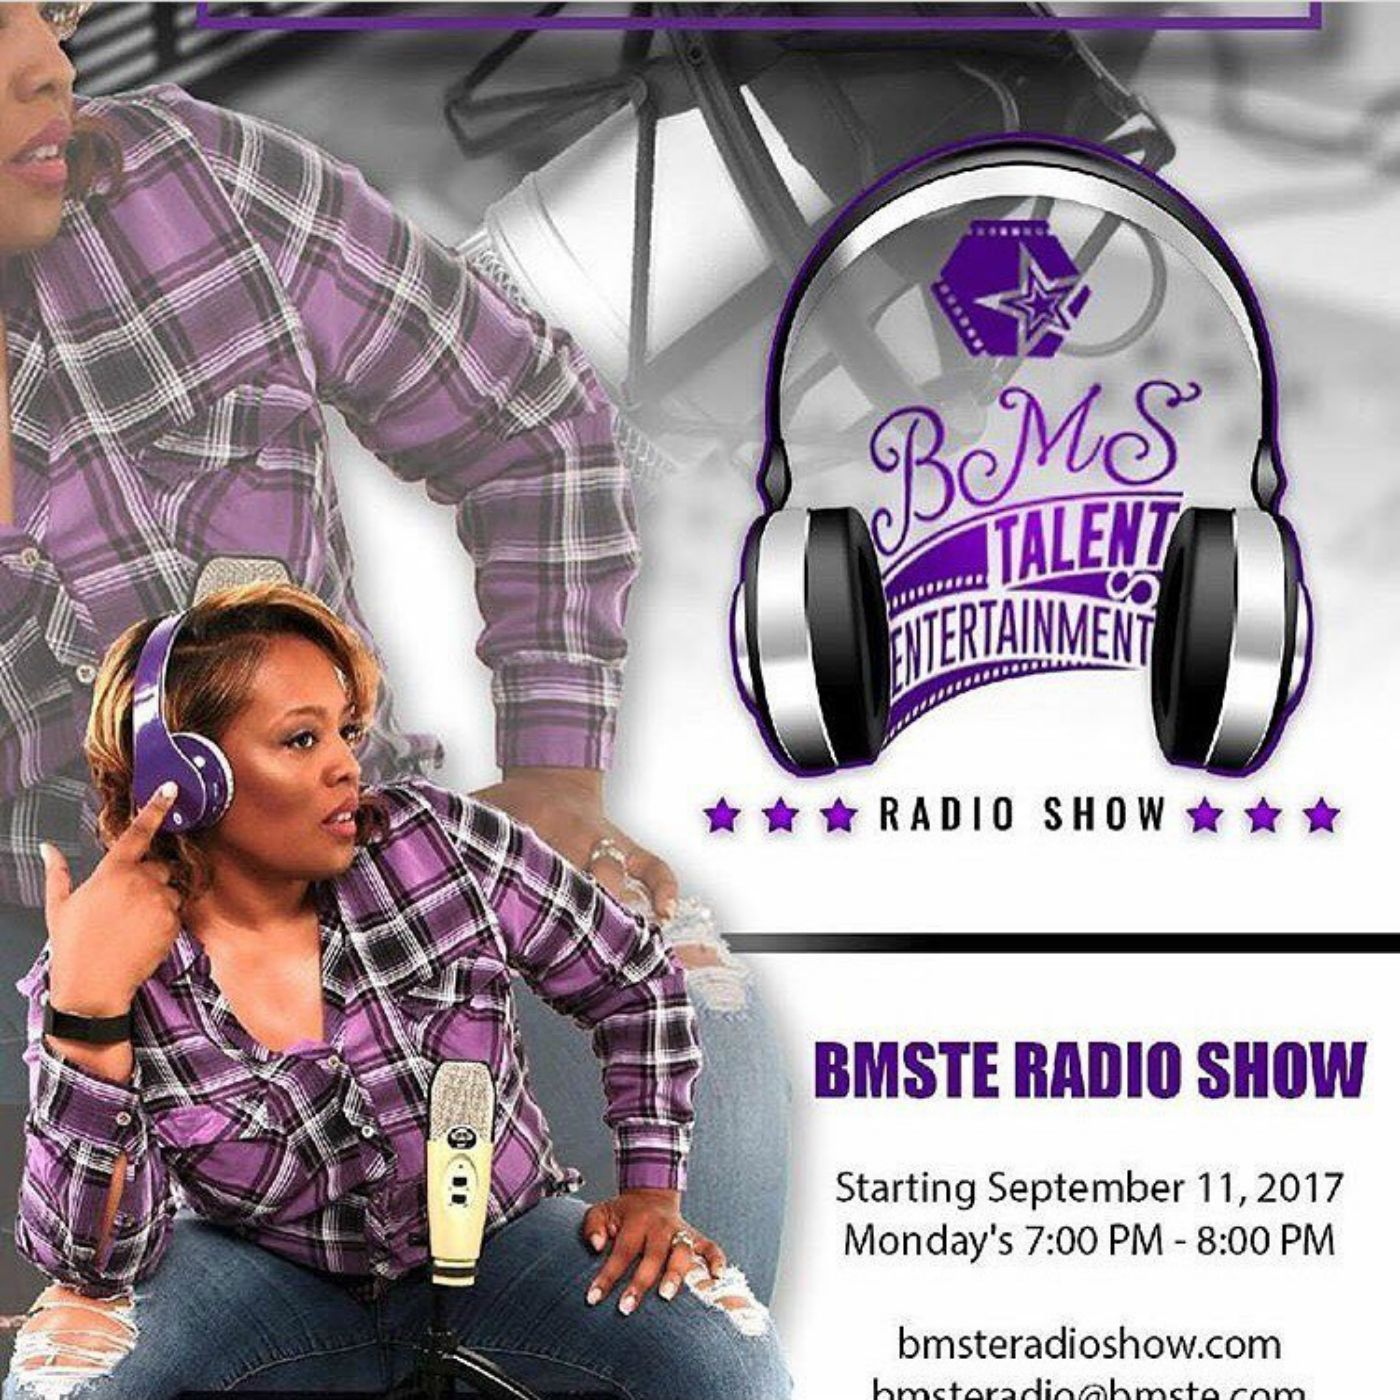 BMSTE Radio